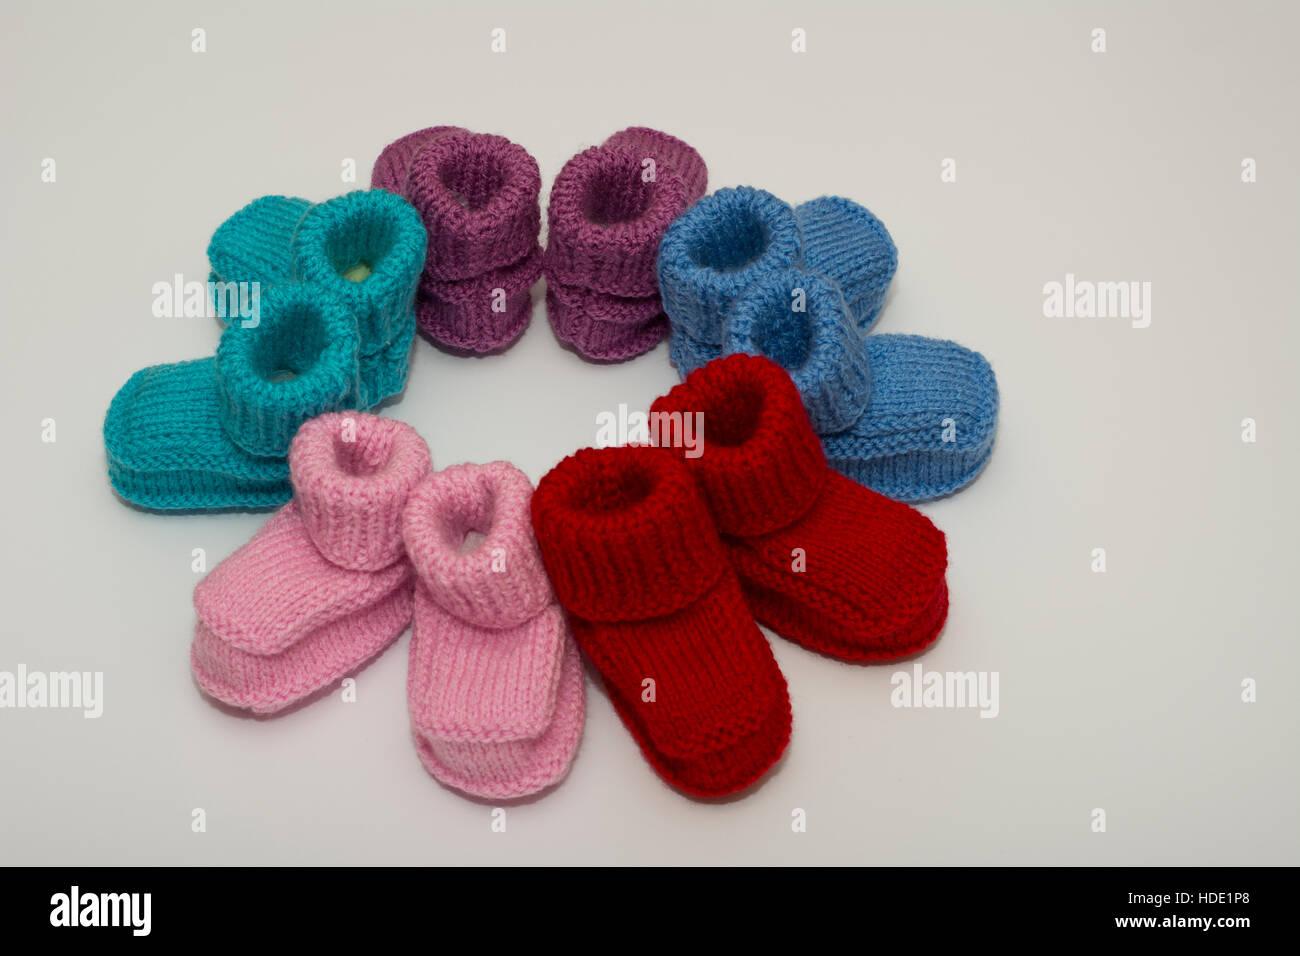 online store b9c36 87be5 Baby, Schuhe, Kleidung, häkeln, gehäkelt, Schuh, Schuhe ...